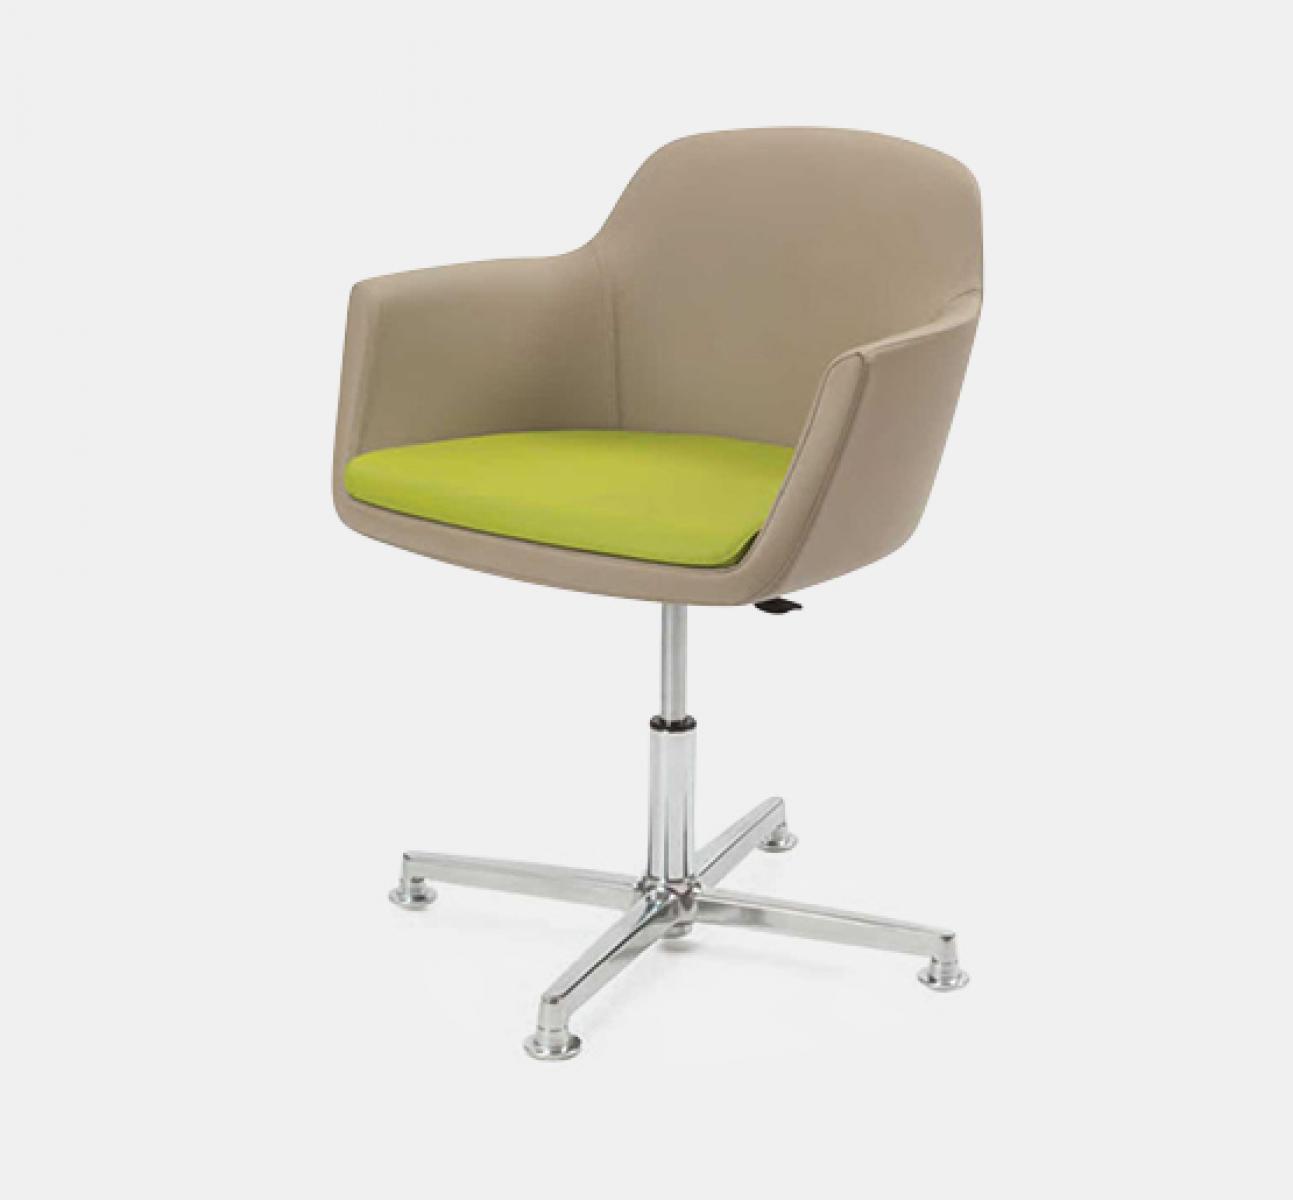 Signora Chair